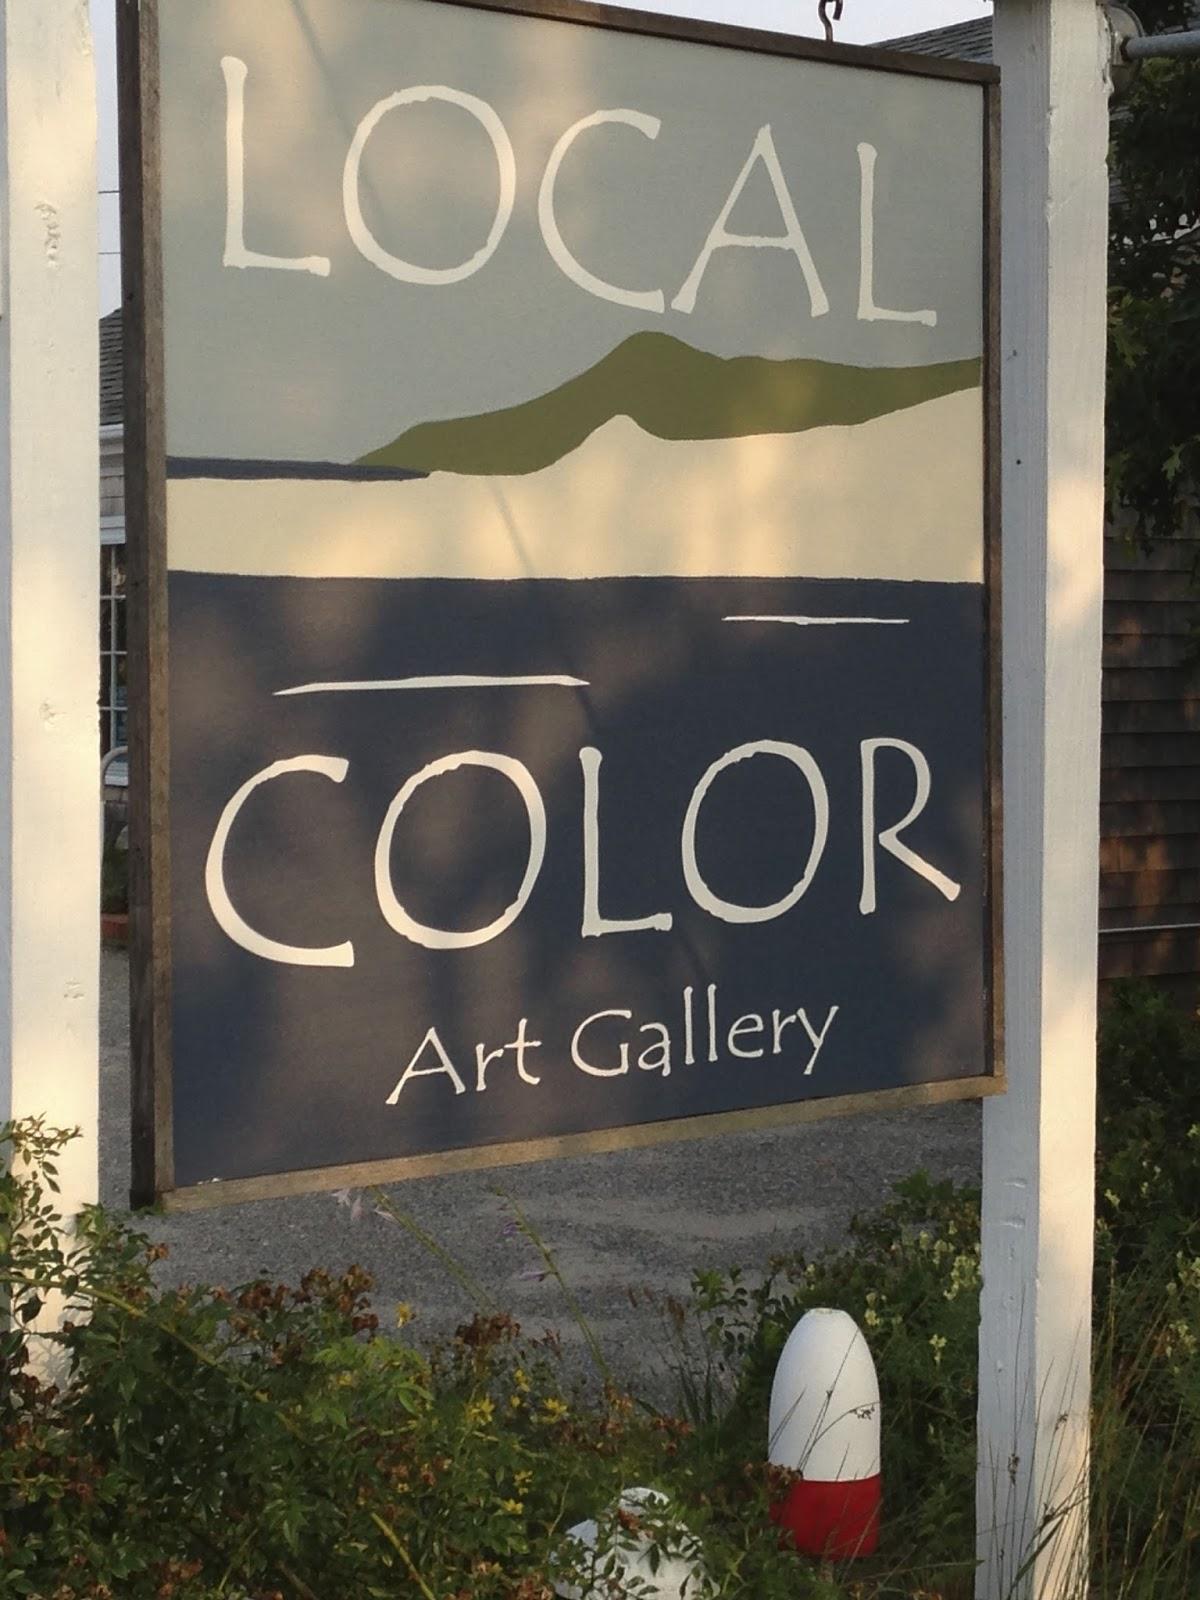 Local Color Examples : local, color, examples, Marash, Girl:, Local, Color,, Chatham,, Massachusetts